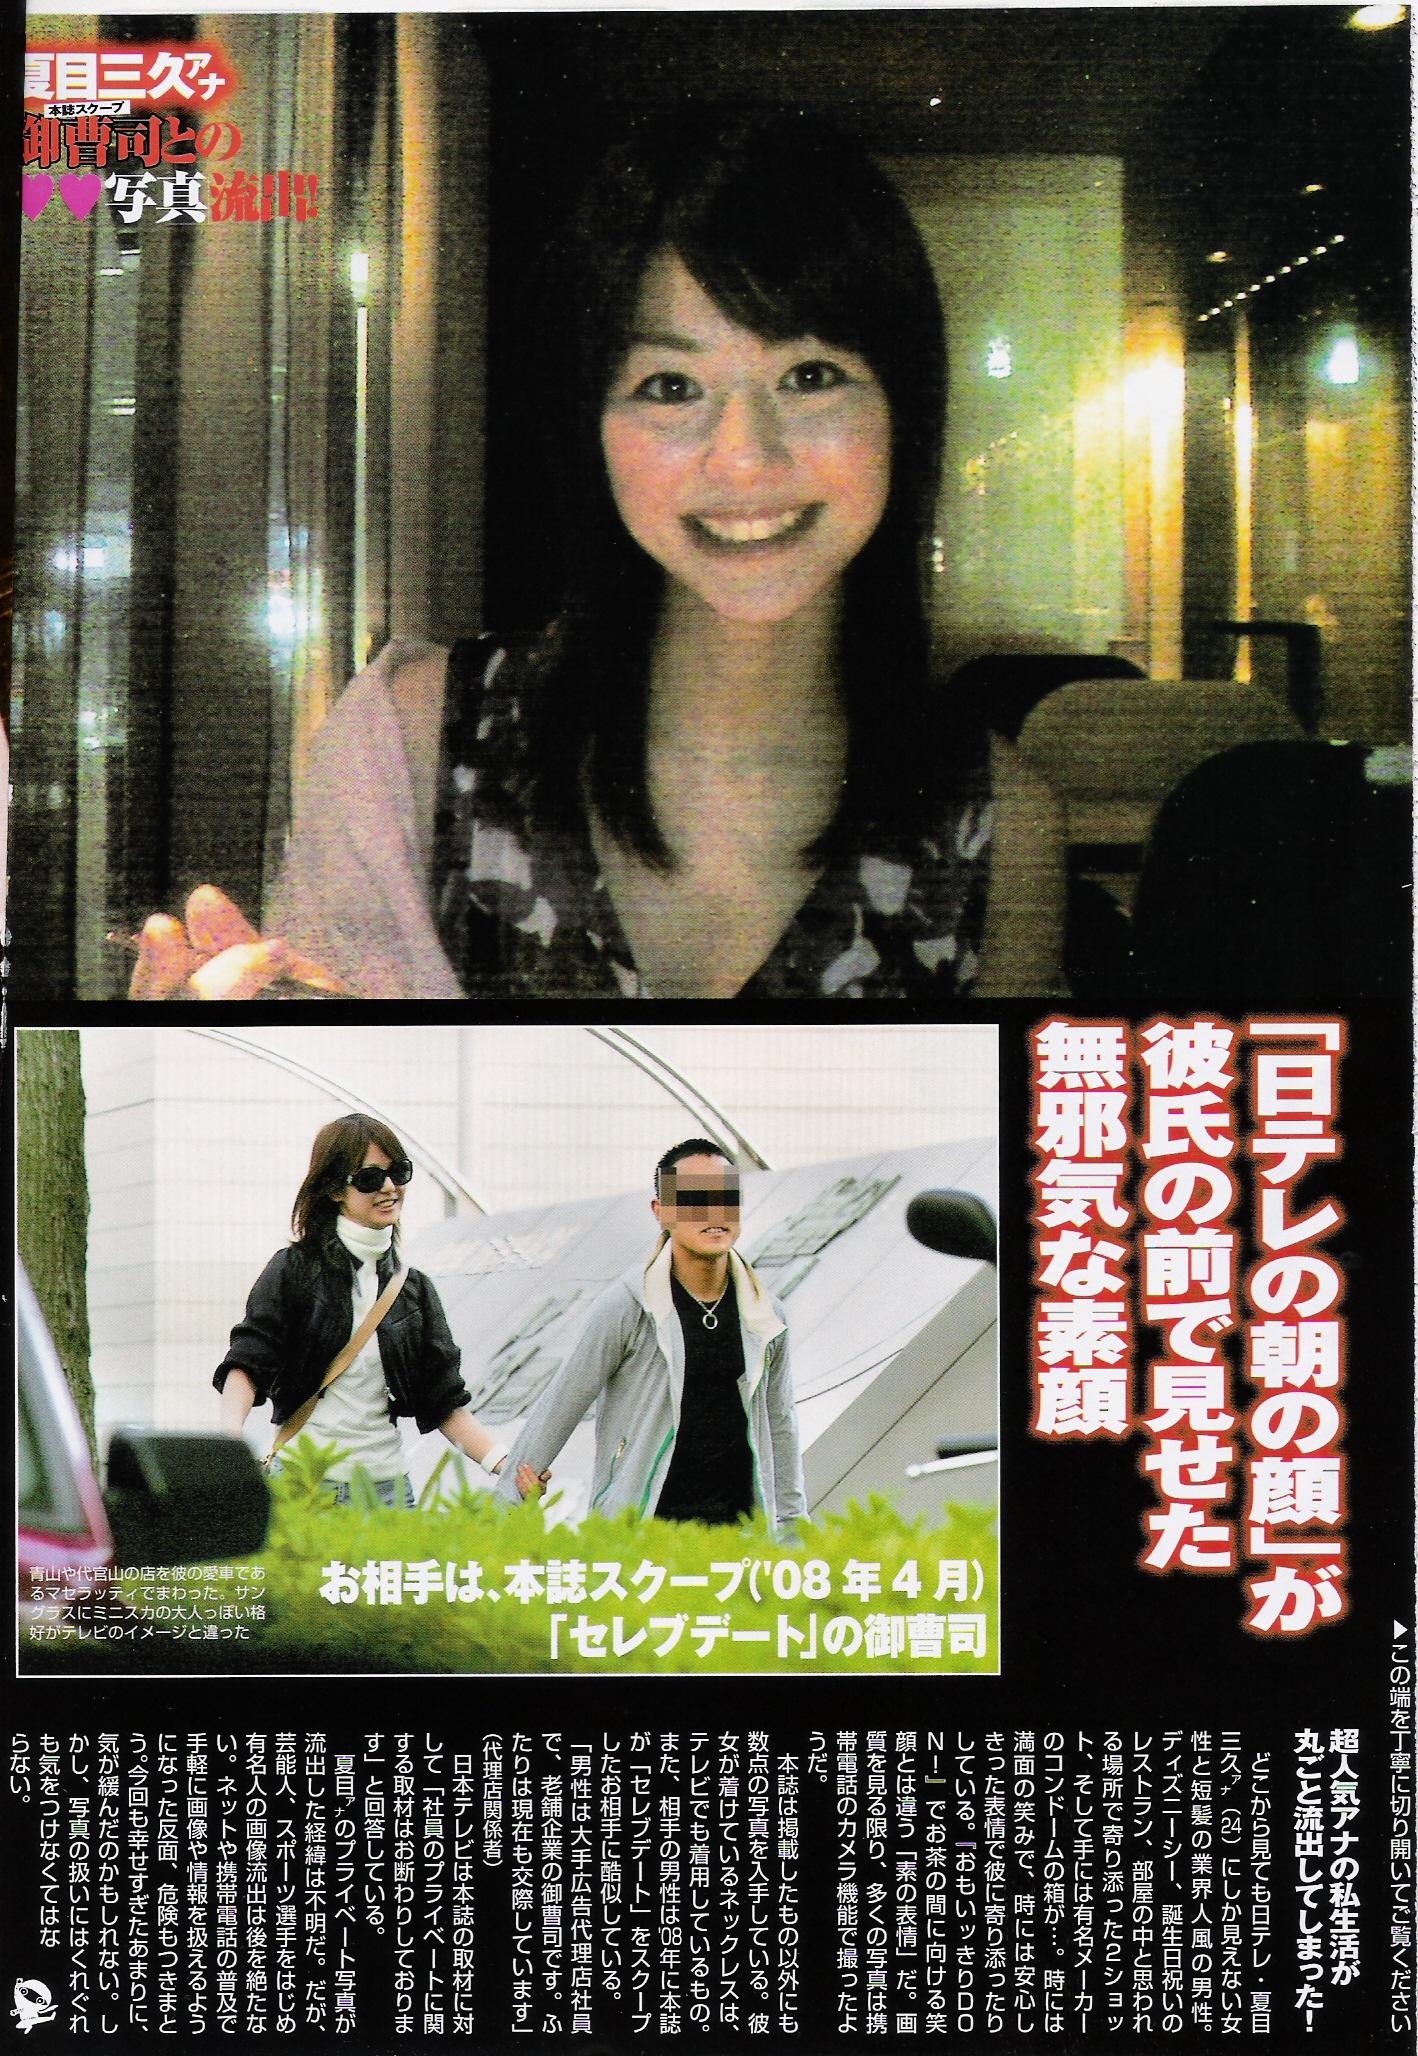 http://livedoor.blogimg.jp/tvmania/imgs/b/e/bef7ccc2.jpg